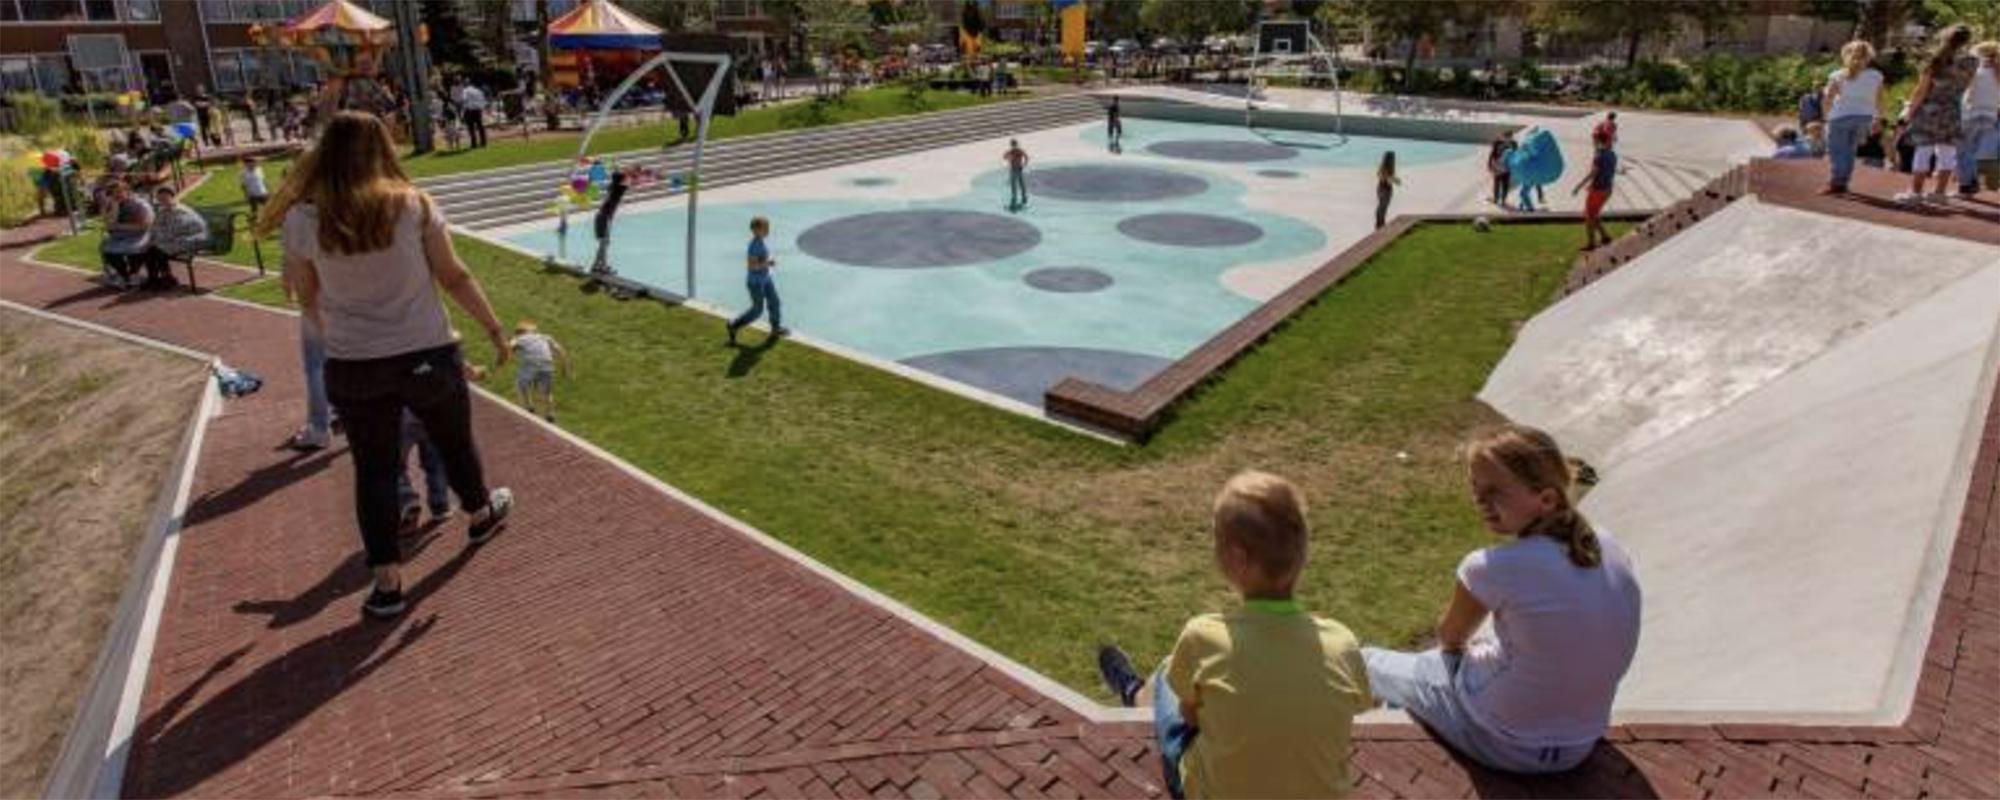 Water Square by de Urbanisten